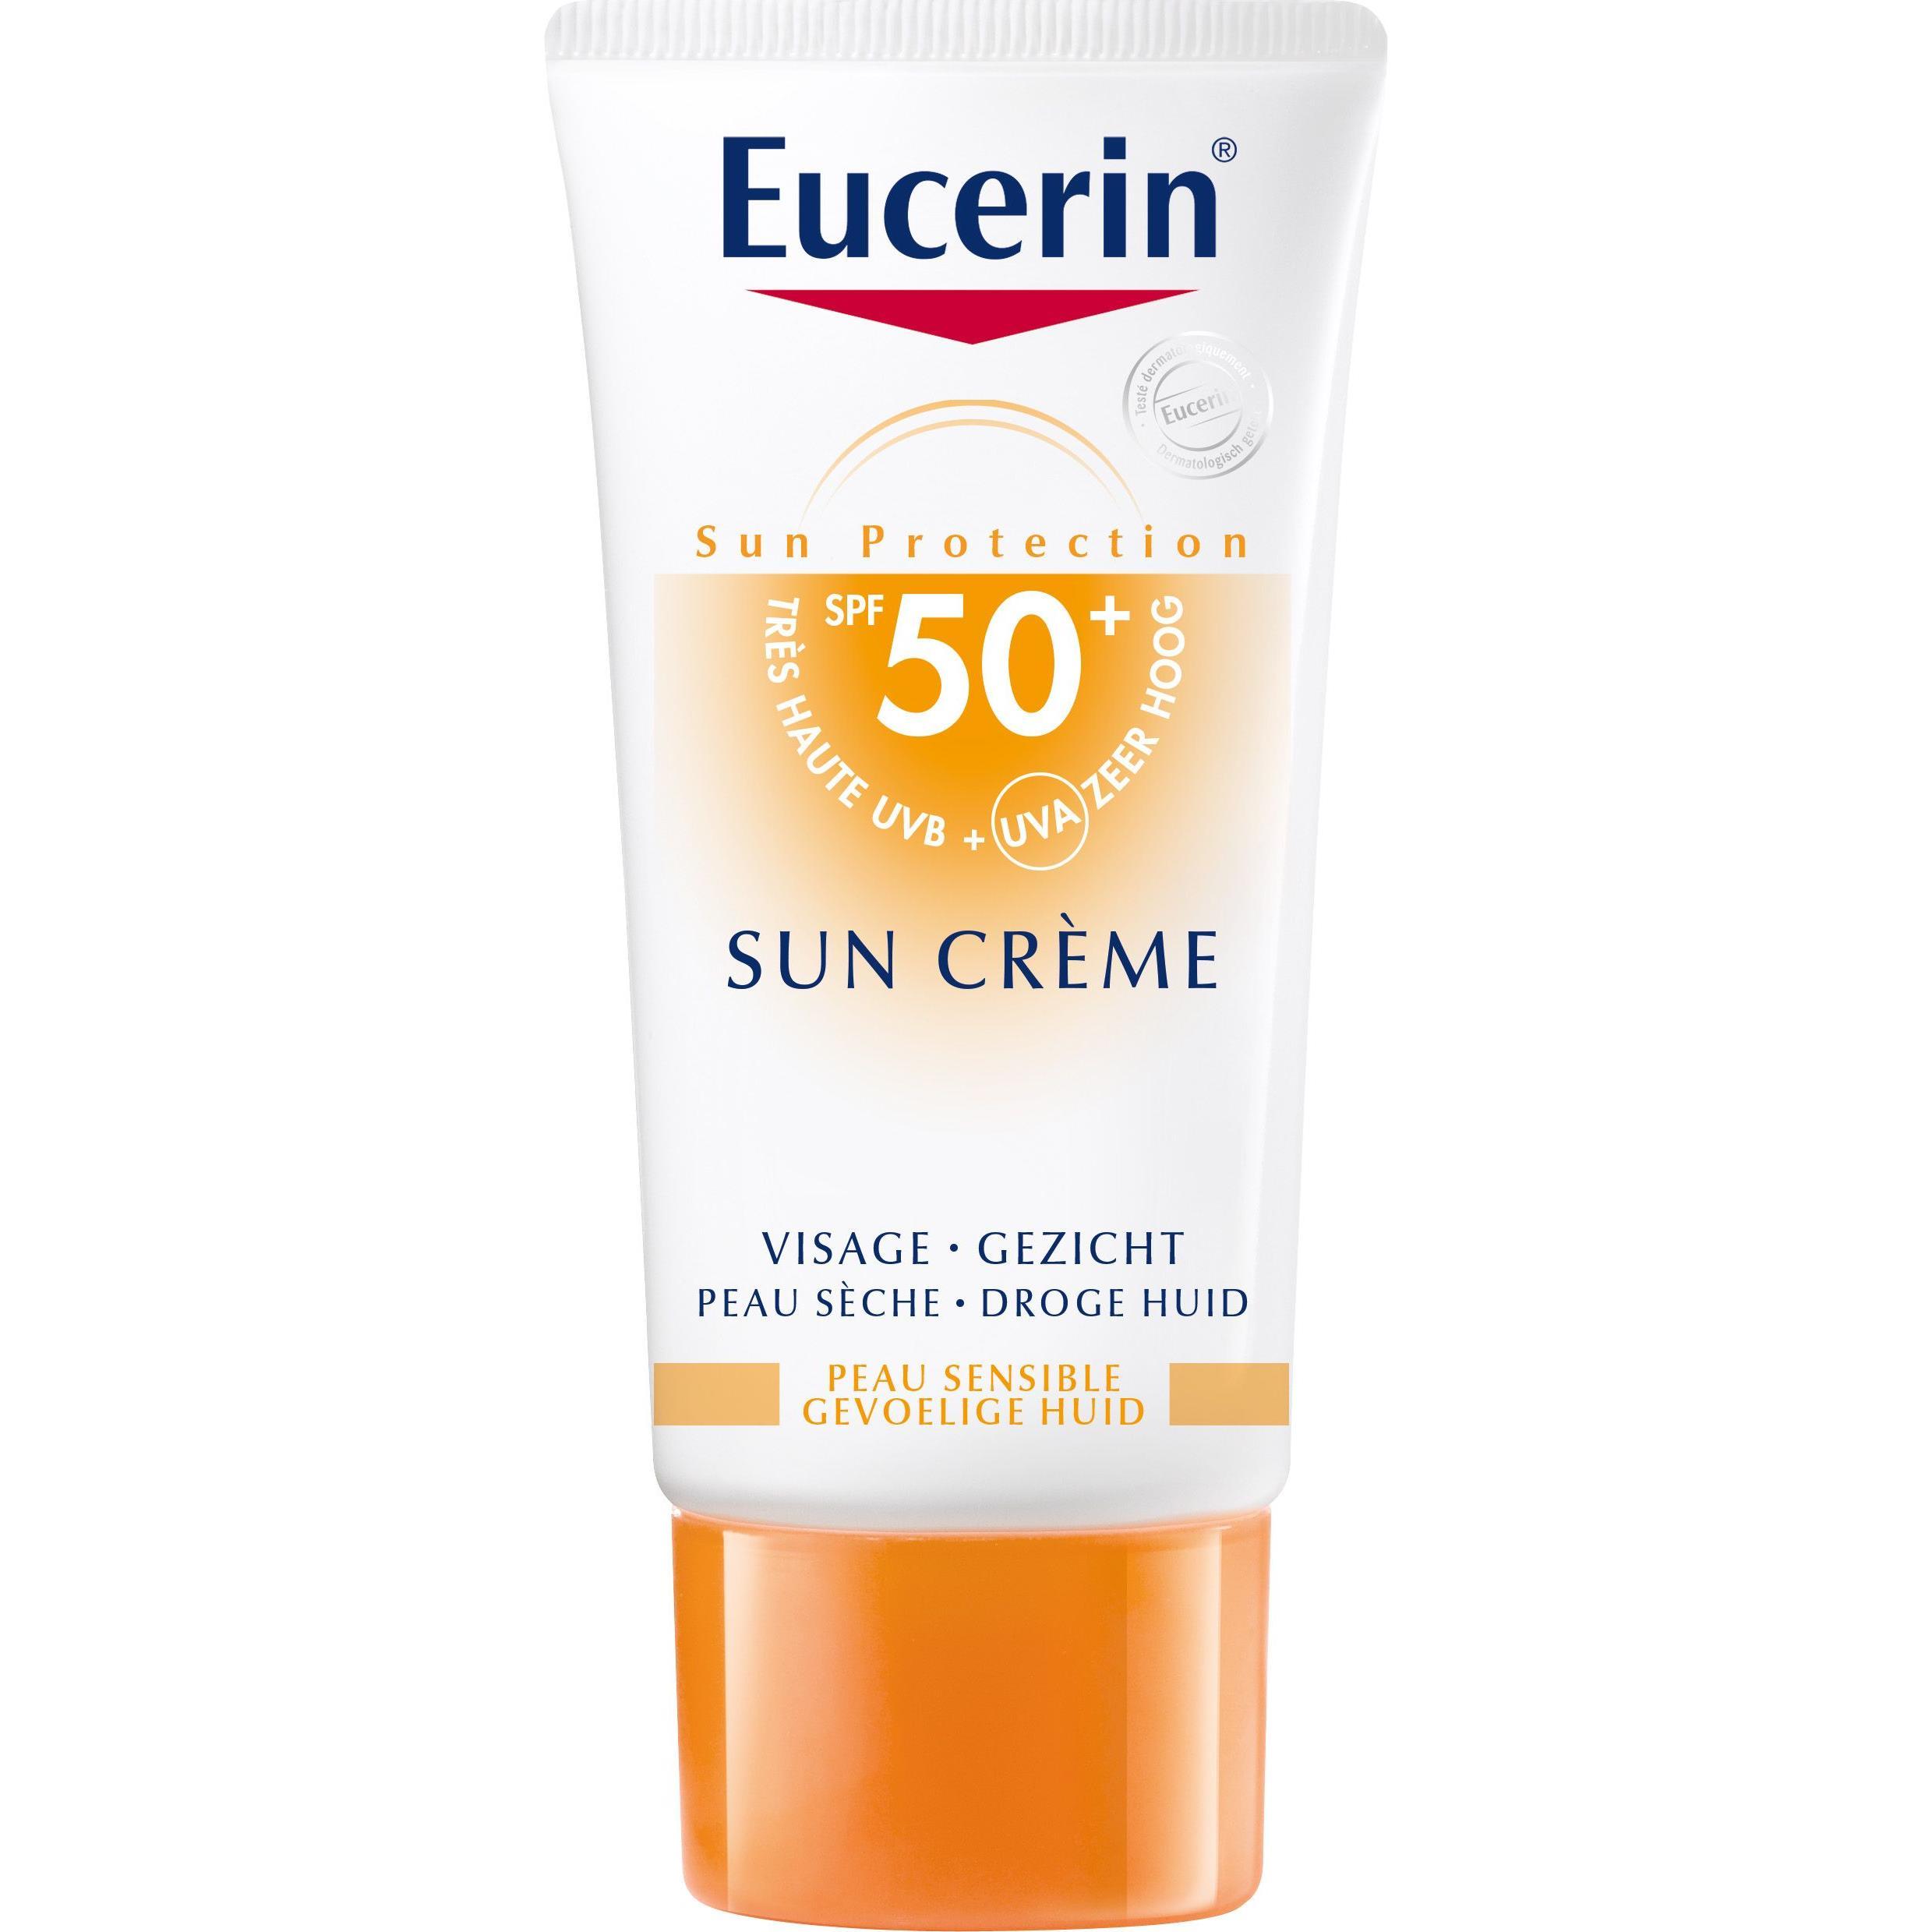 Eucerin Zonnebrand Creme Face Factor(spf)50+ 50ml